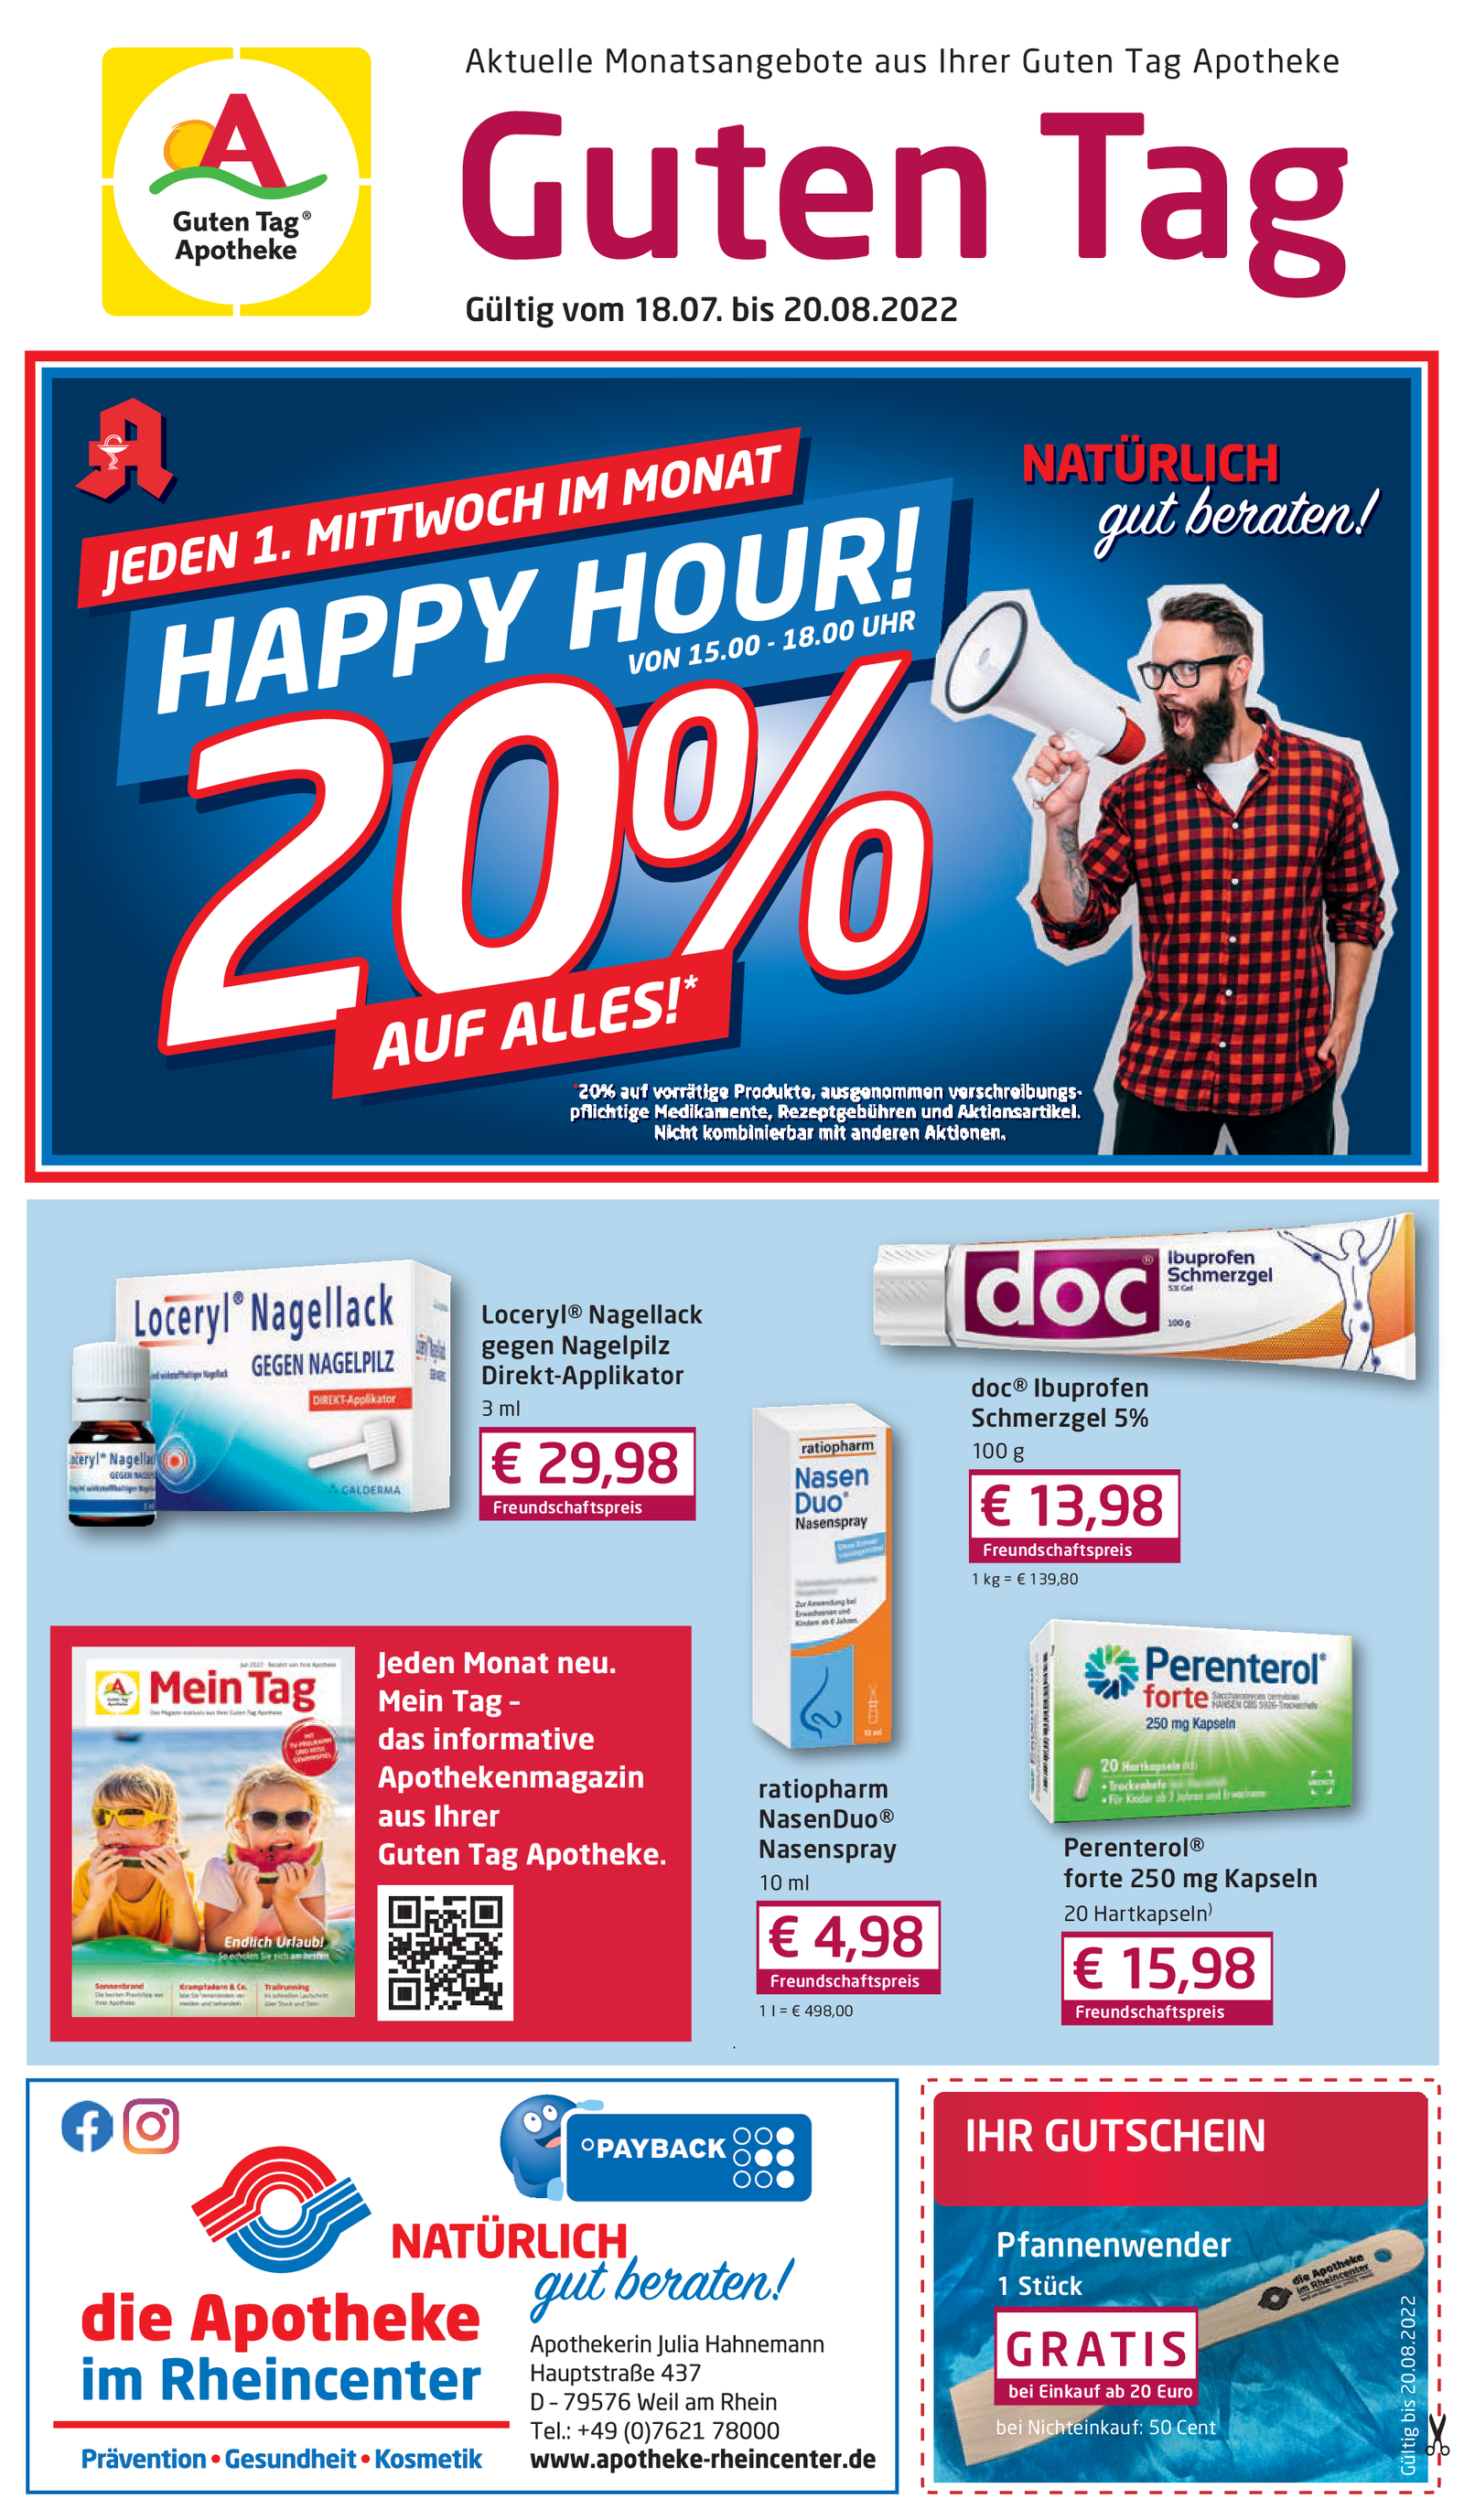 https://mein-uploads.apocdn.net/10275/leaflets/10275_flyer-Seite1.png